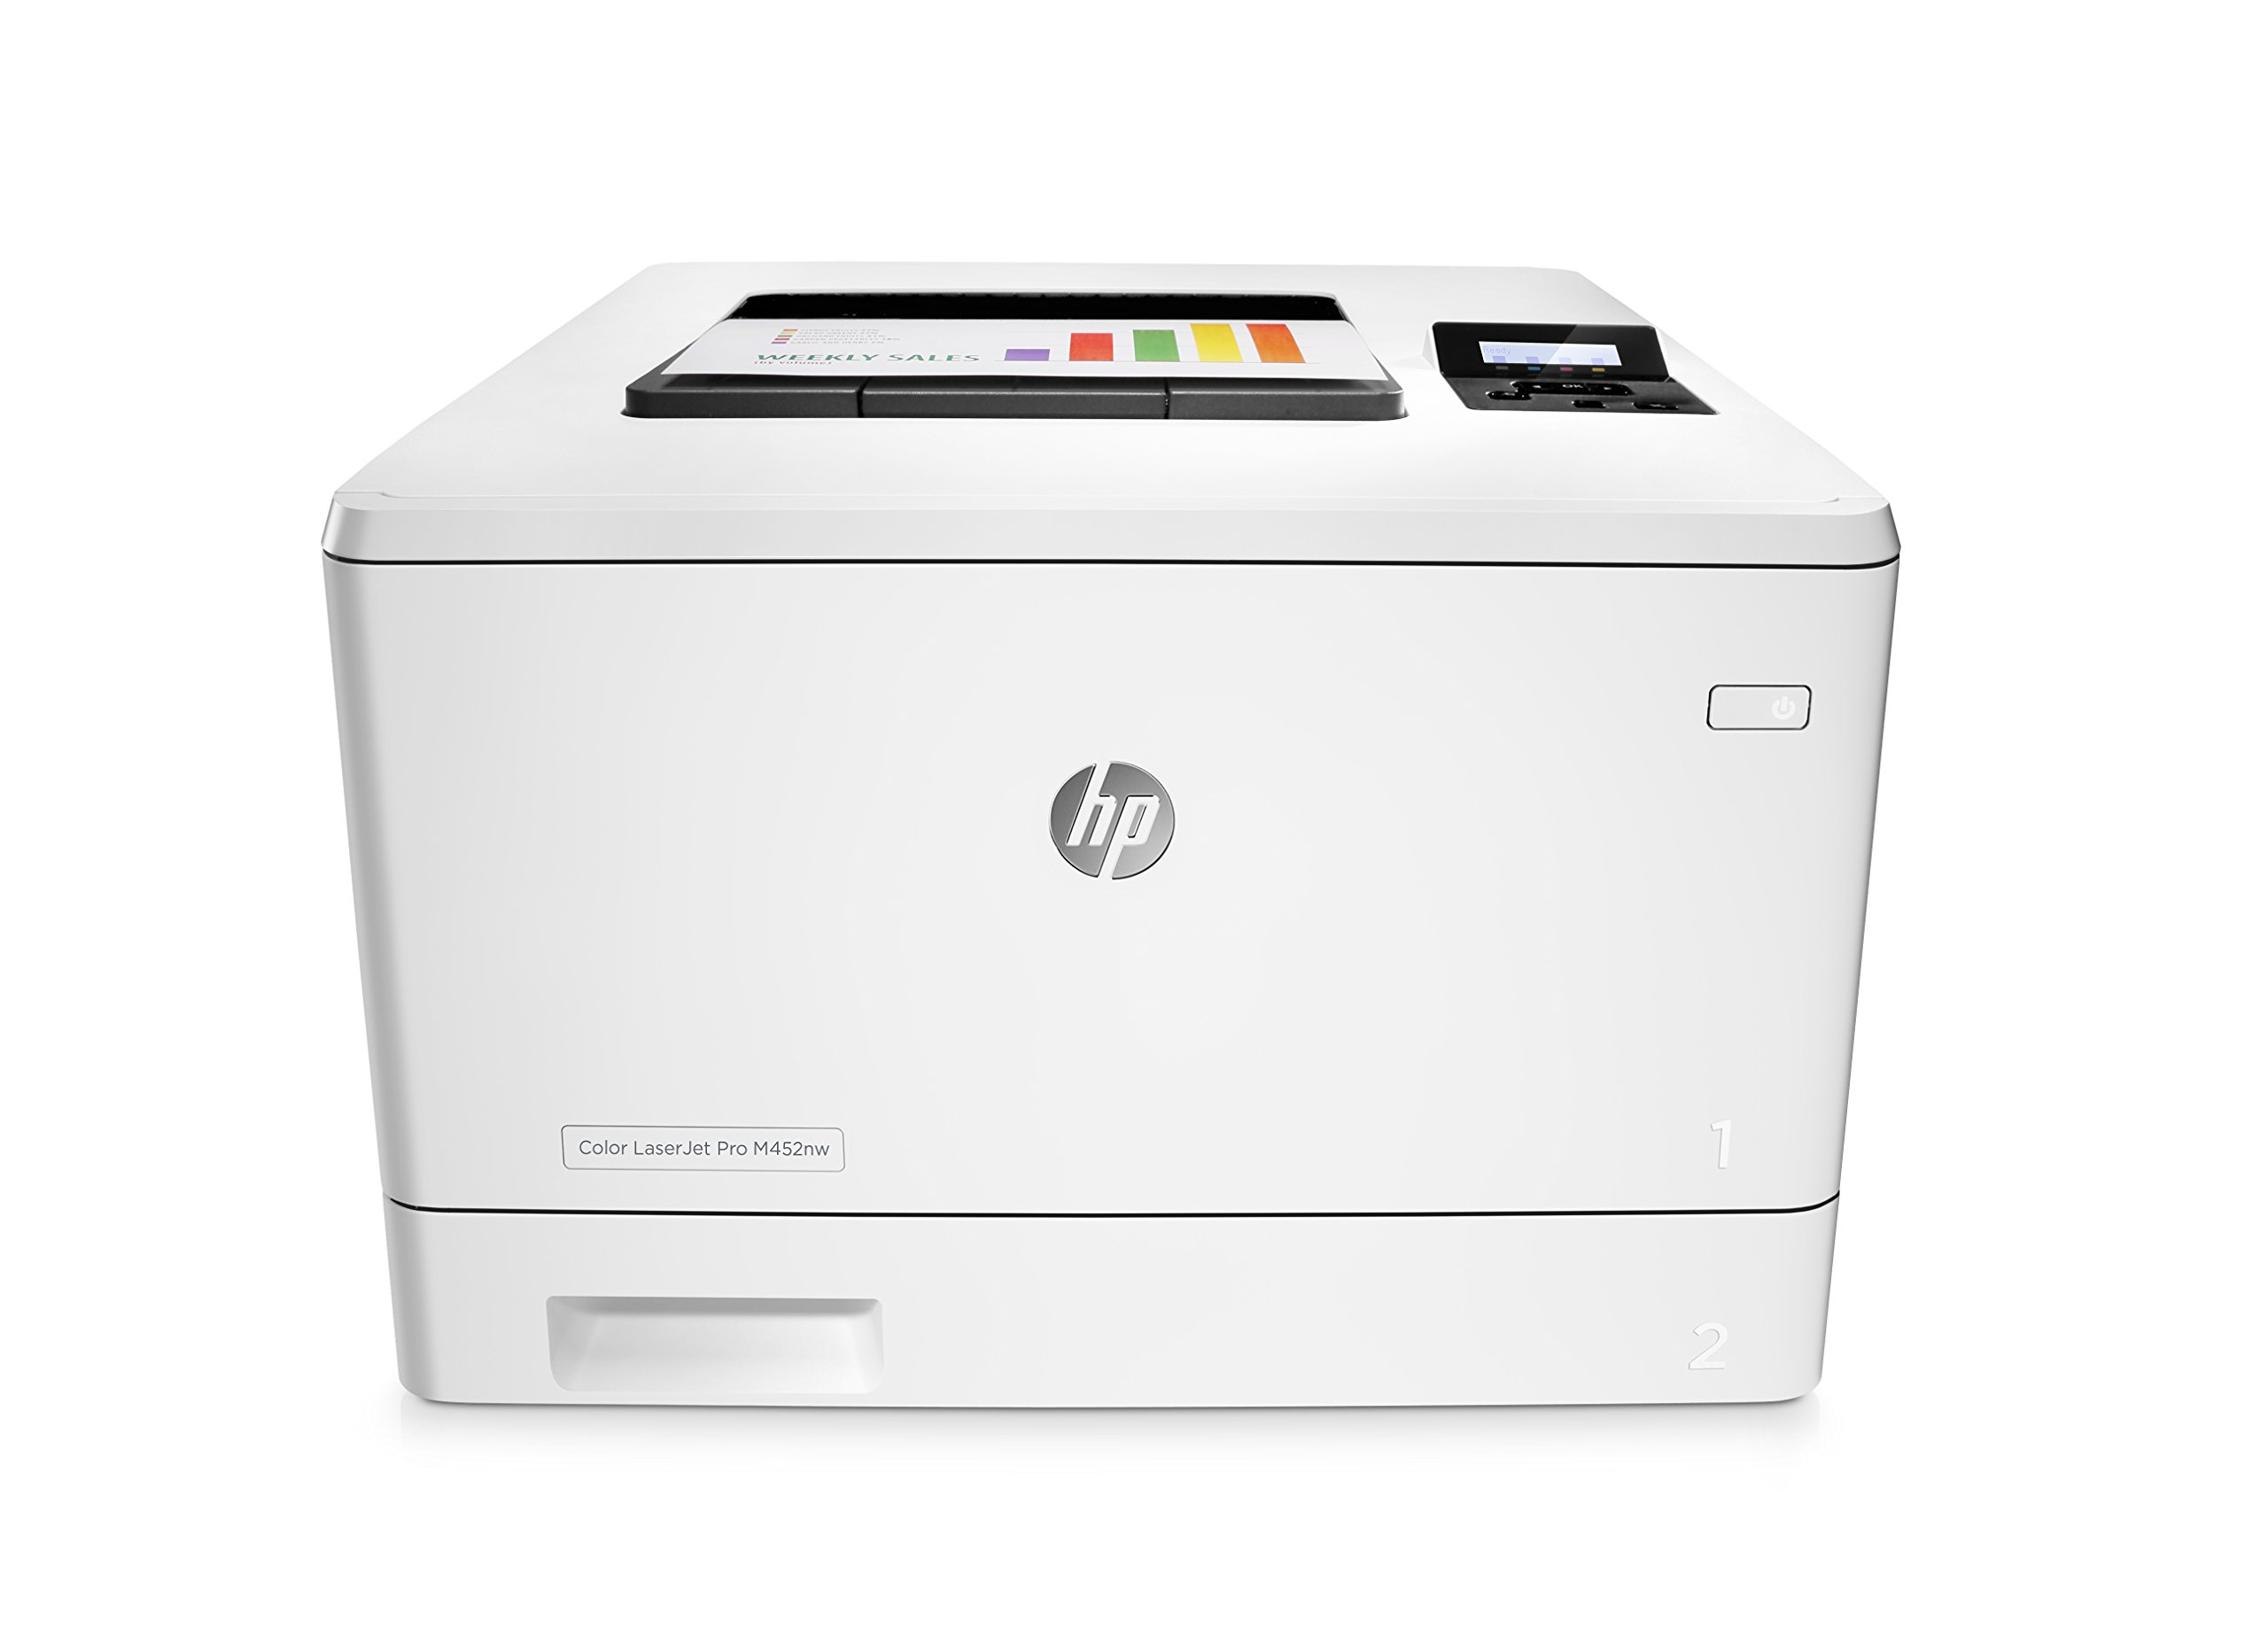 HP Laserjet Pro M452nw Wireless Color Printer by HP